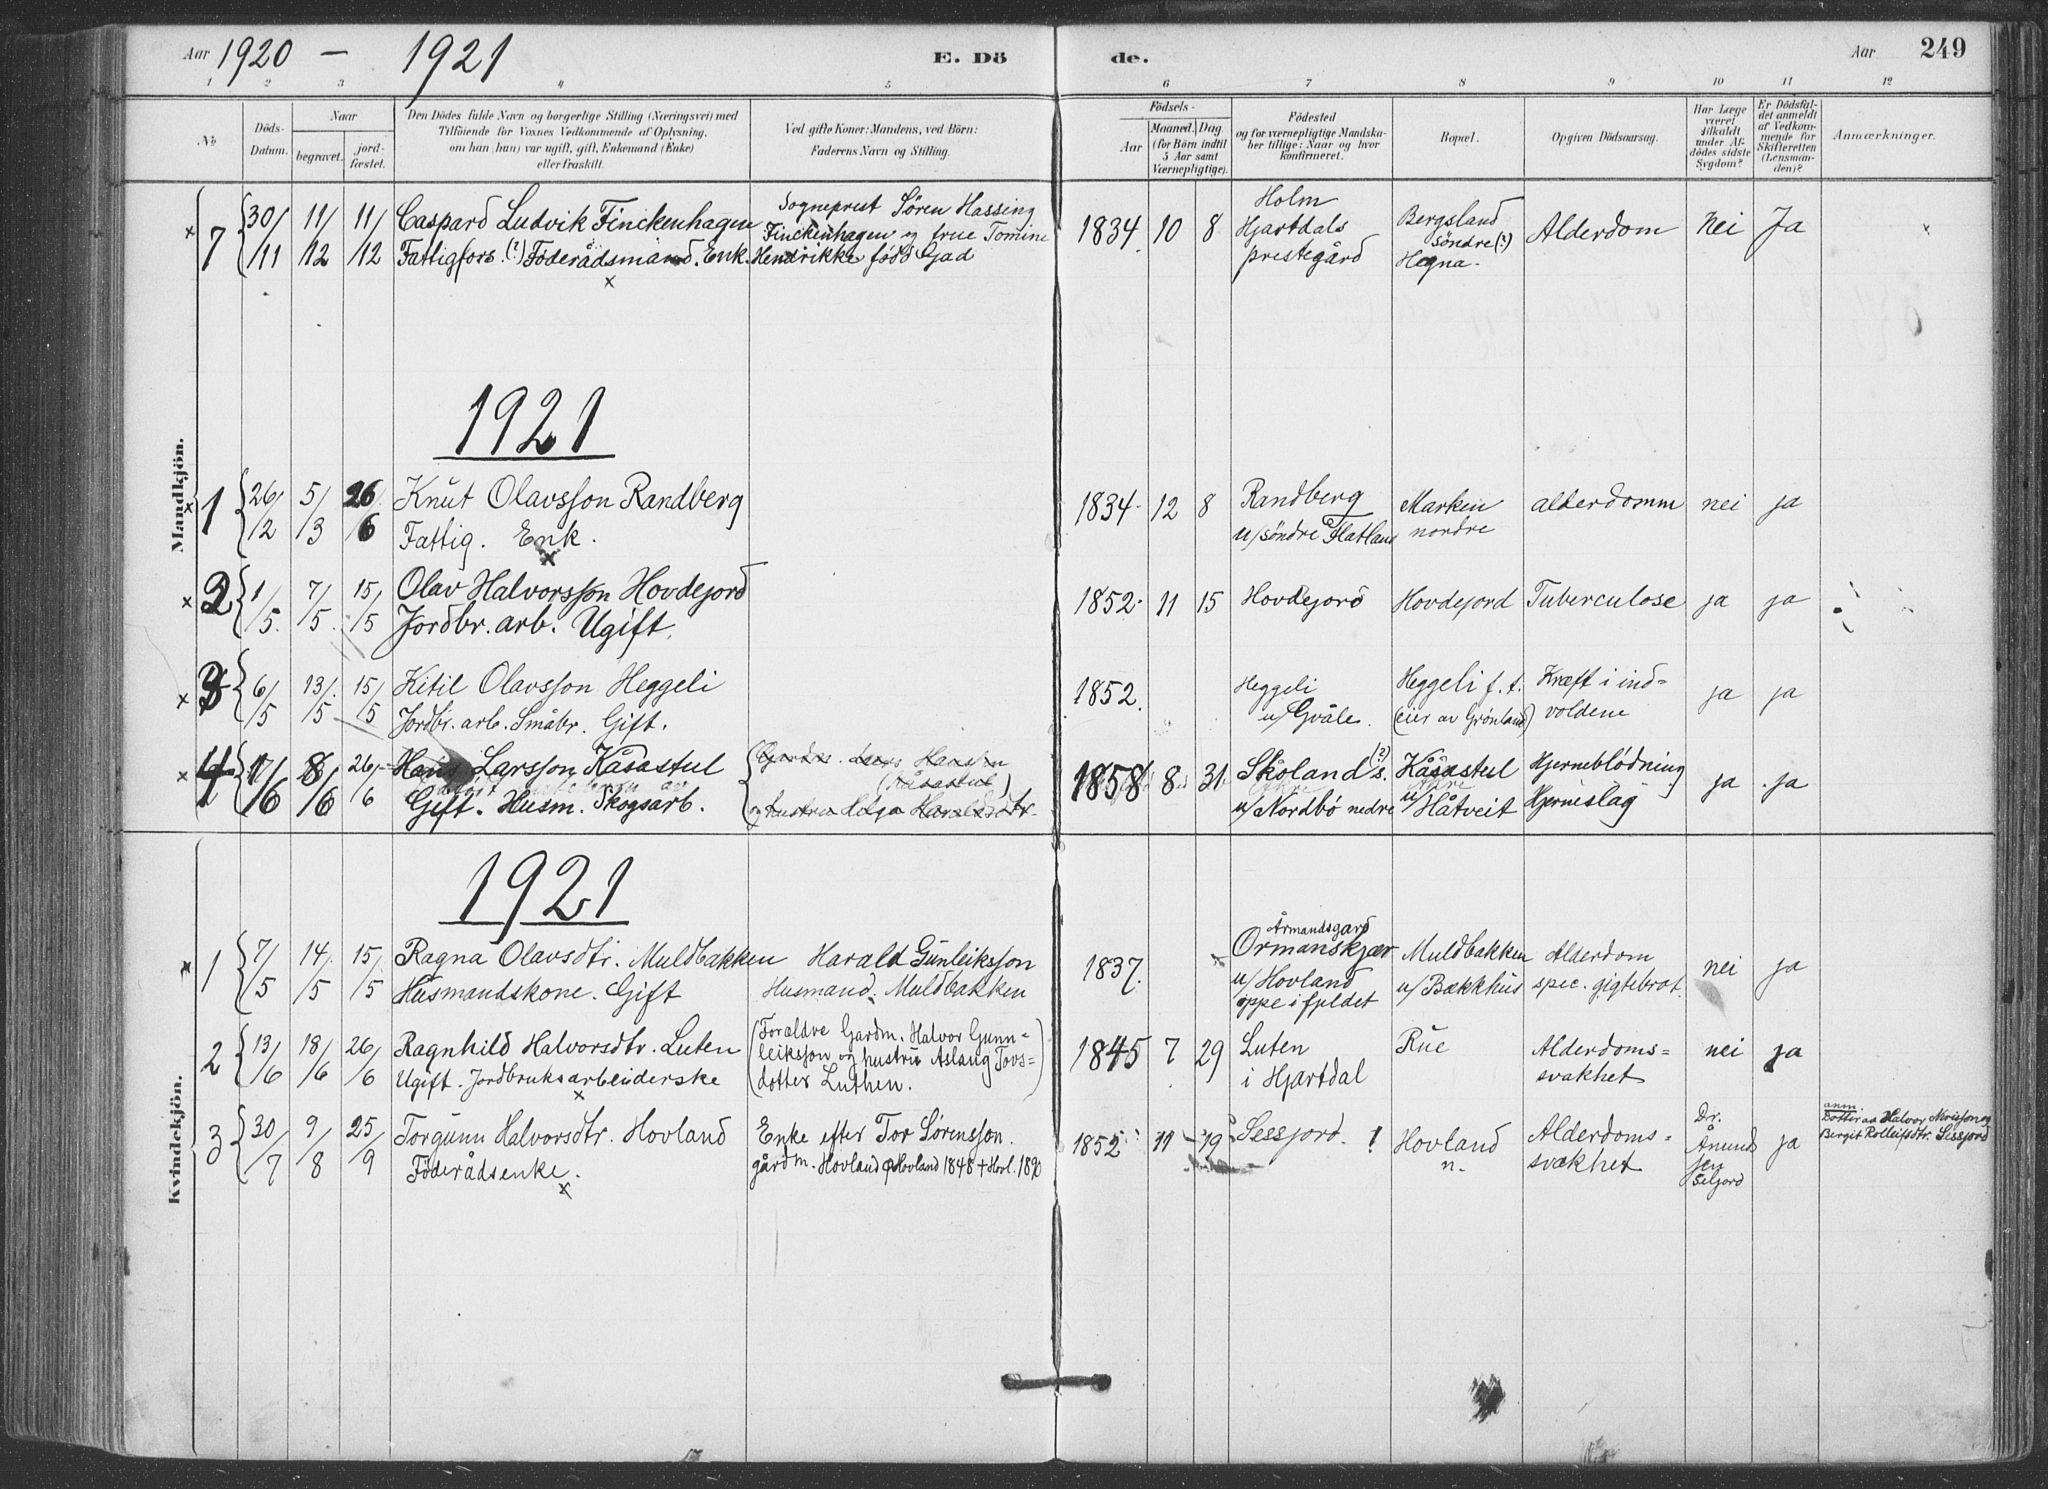 SAKO, Hjartdal kirkebøker, F/Fa/L0010: Ministerialbok nr. I 10, 1880-1929, s. 249